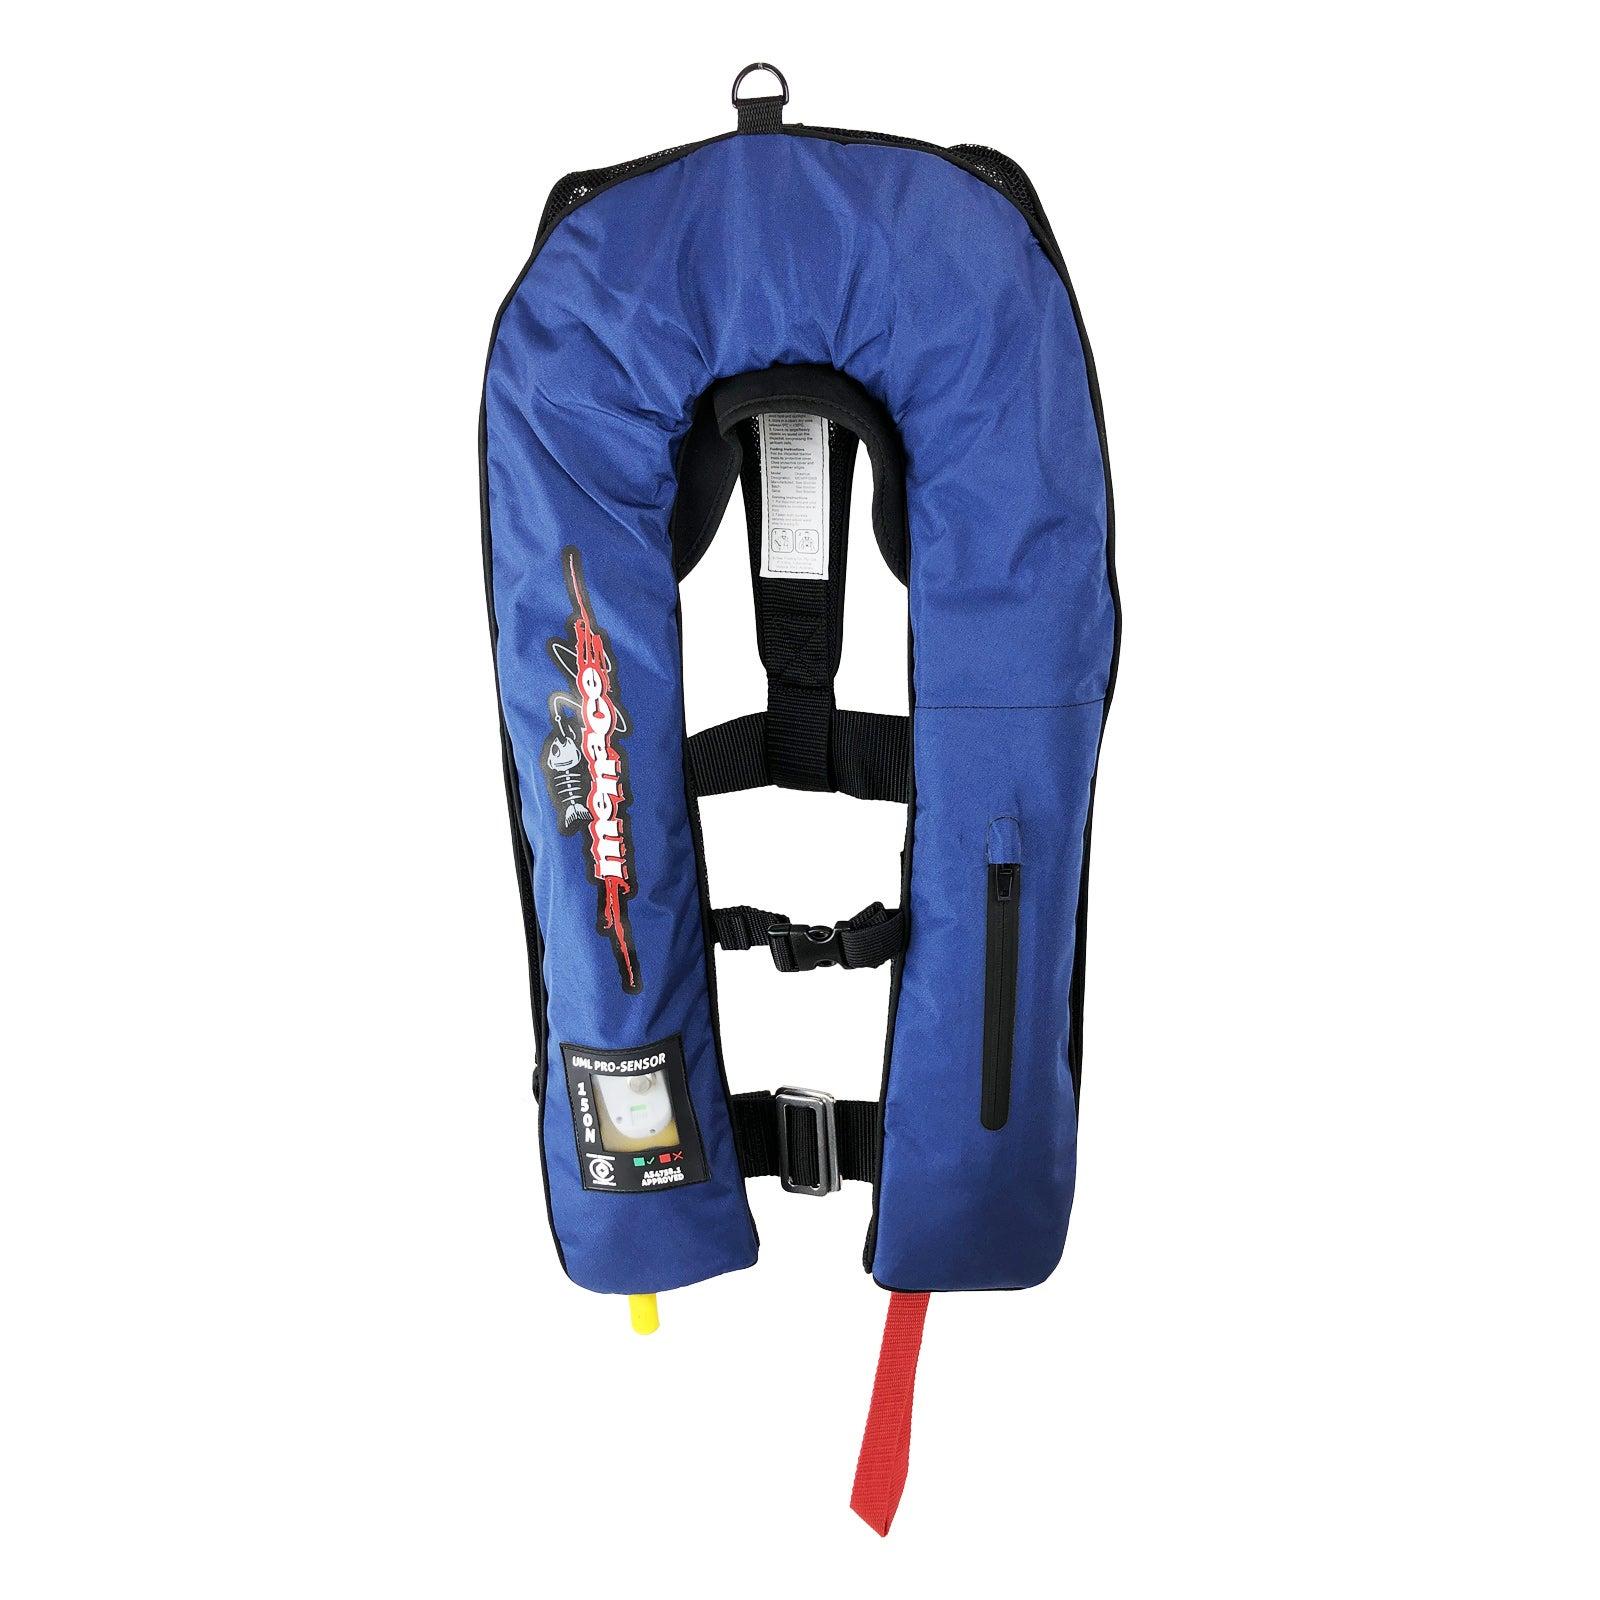 MANUAL PRO Inflatable Life Jacket PFD Type 1 LifeJackets Level 150N